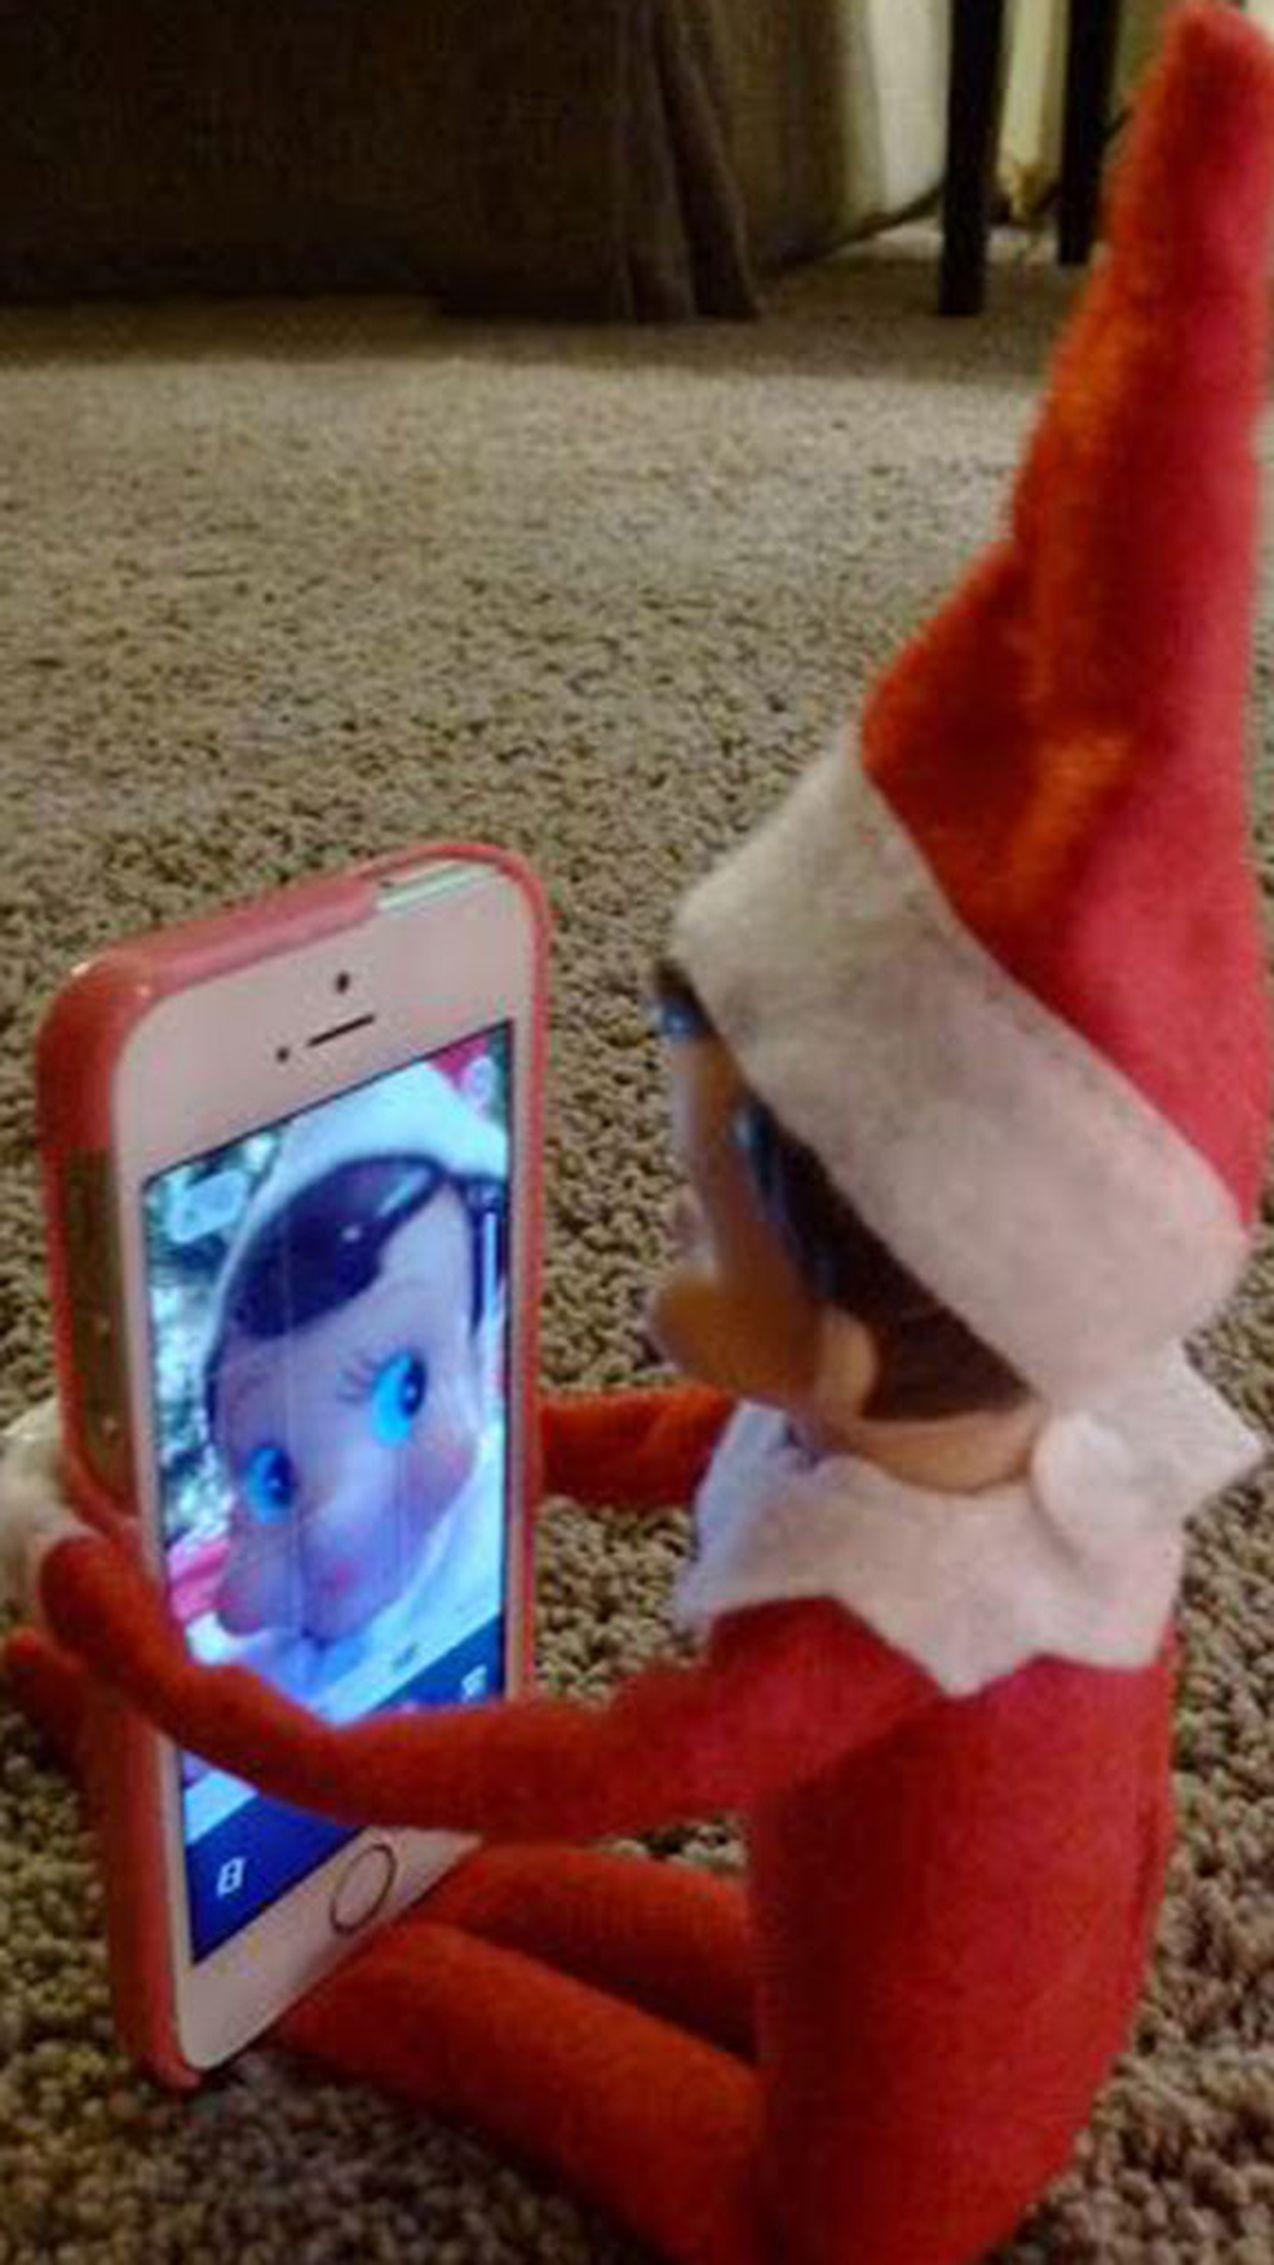 Hilarious Elf on the Shelf ideas that are more naughty than nice - 9Honey #naughtyelfontheshelfideas